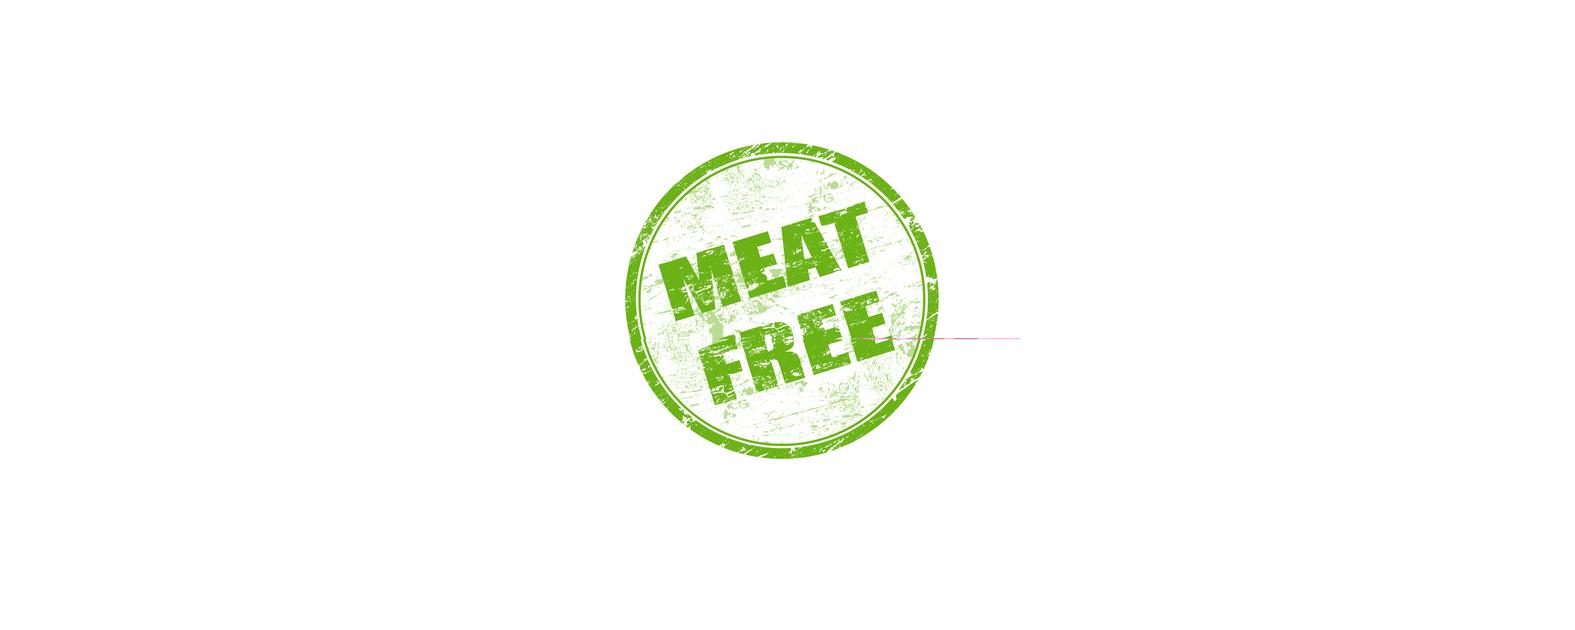 This weeks meat free recipe